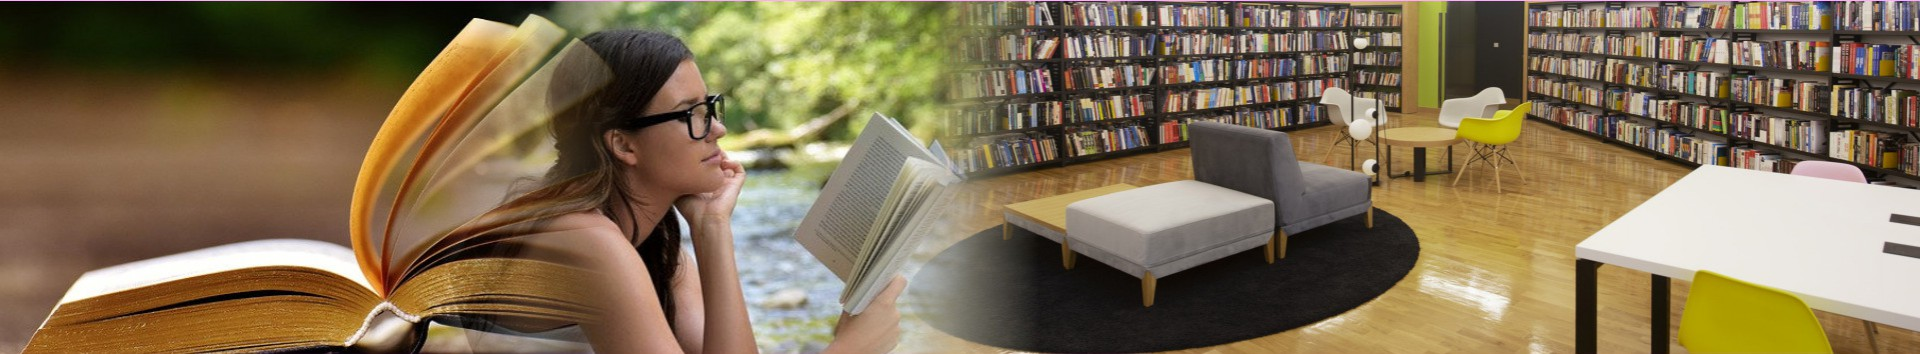 Gradska knjižnica i čitaonica